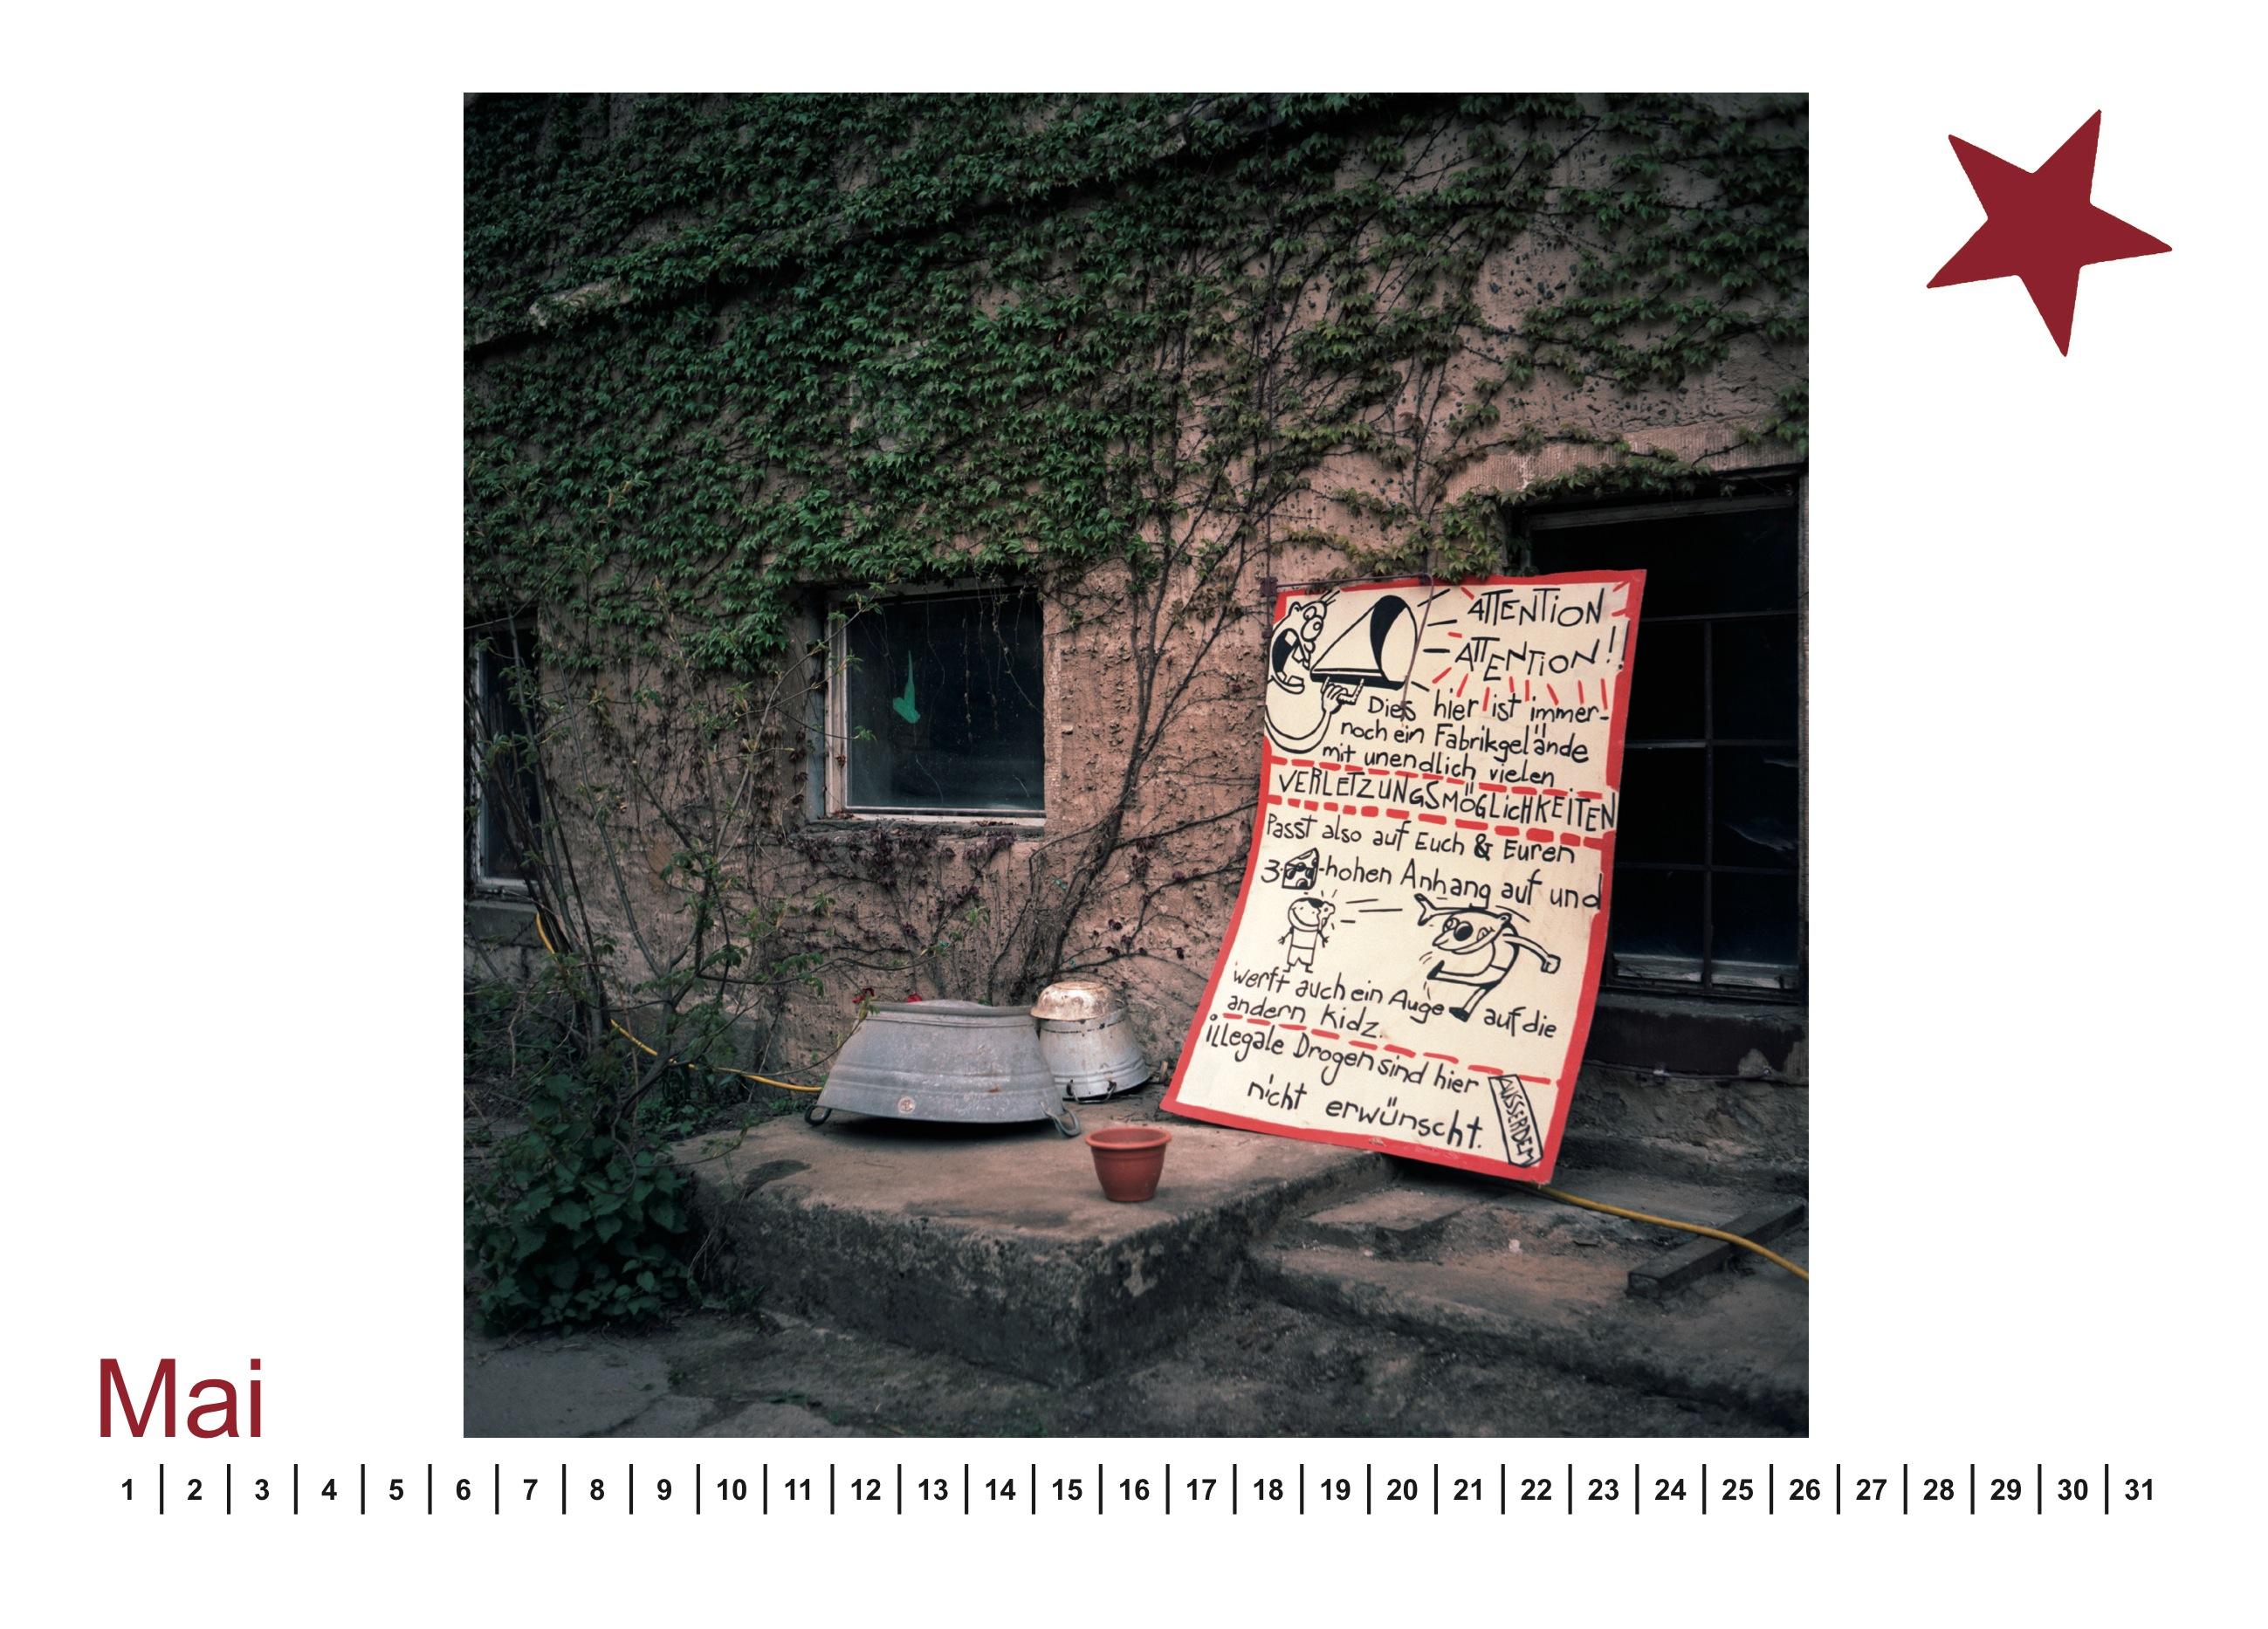 006_pdf-to-jpg